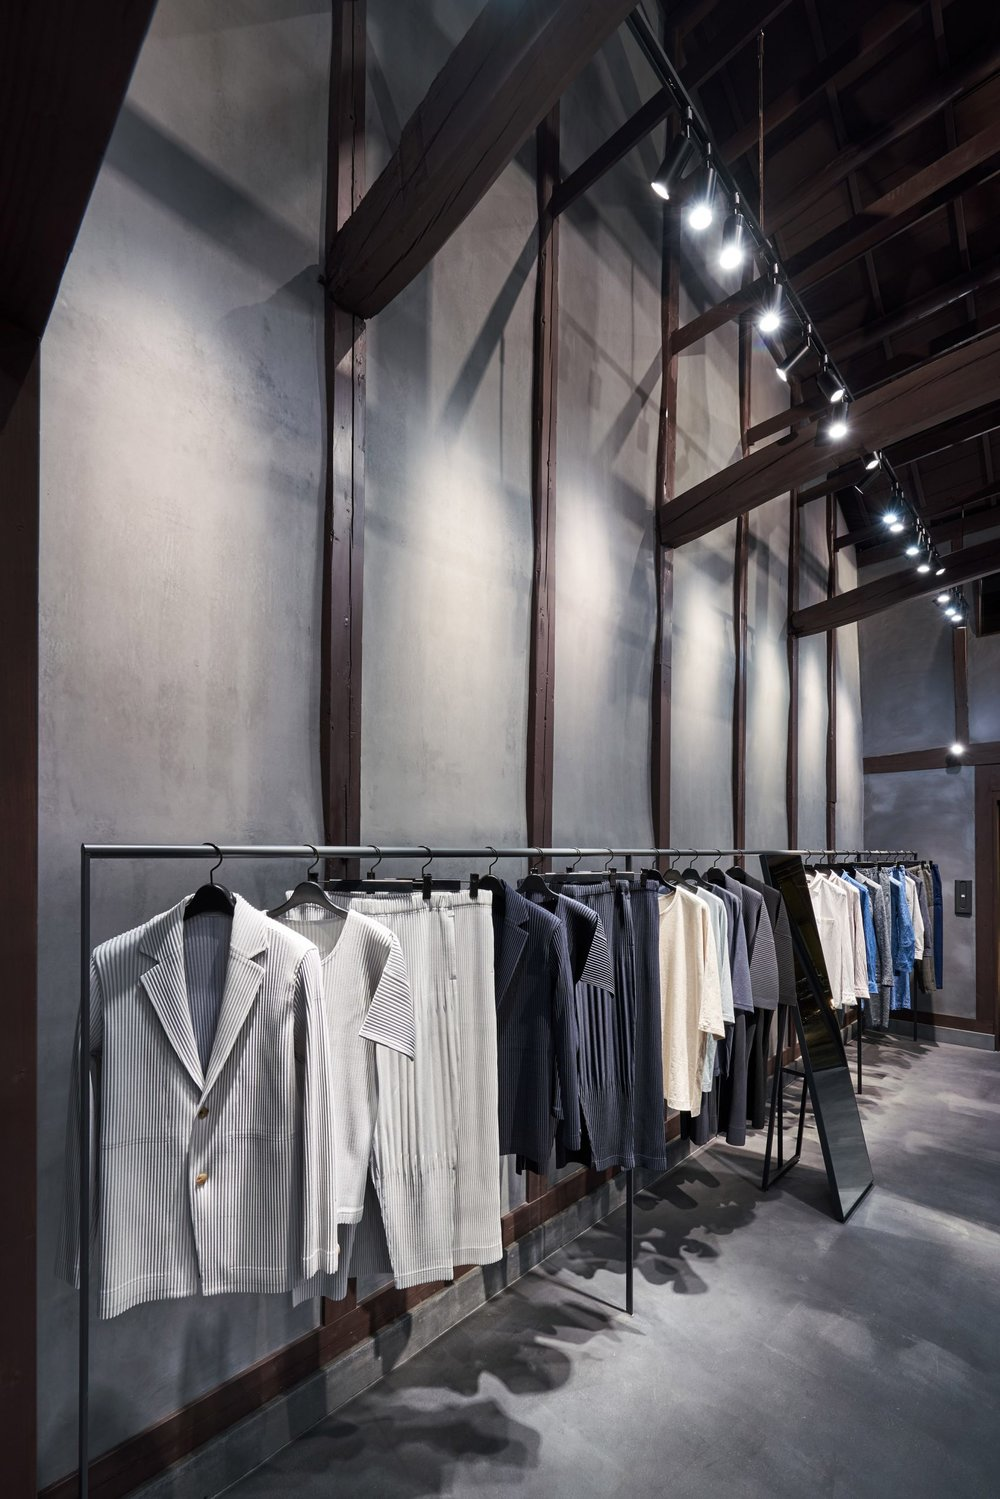 interiors-retail-shops-issey-miyake-kyoto-japan_dezeen_2364_col_6-1704x2555.jpg